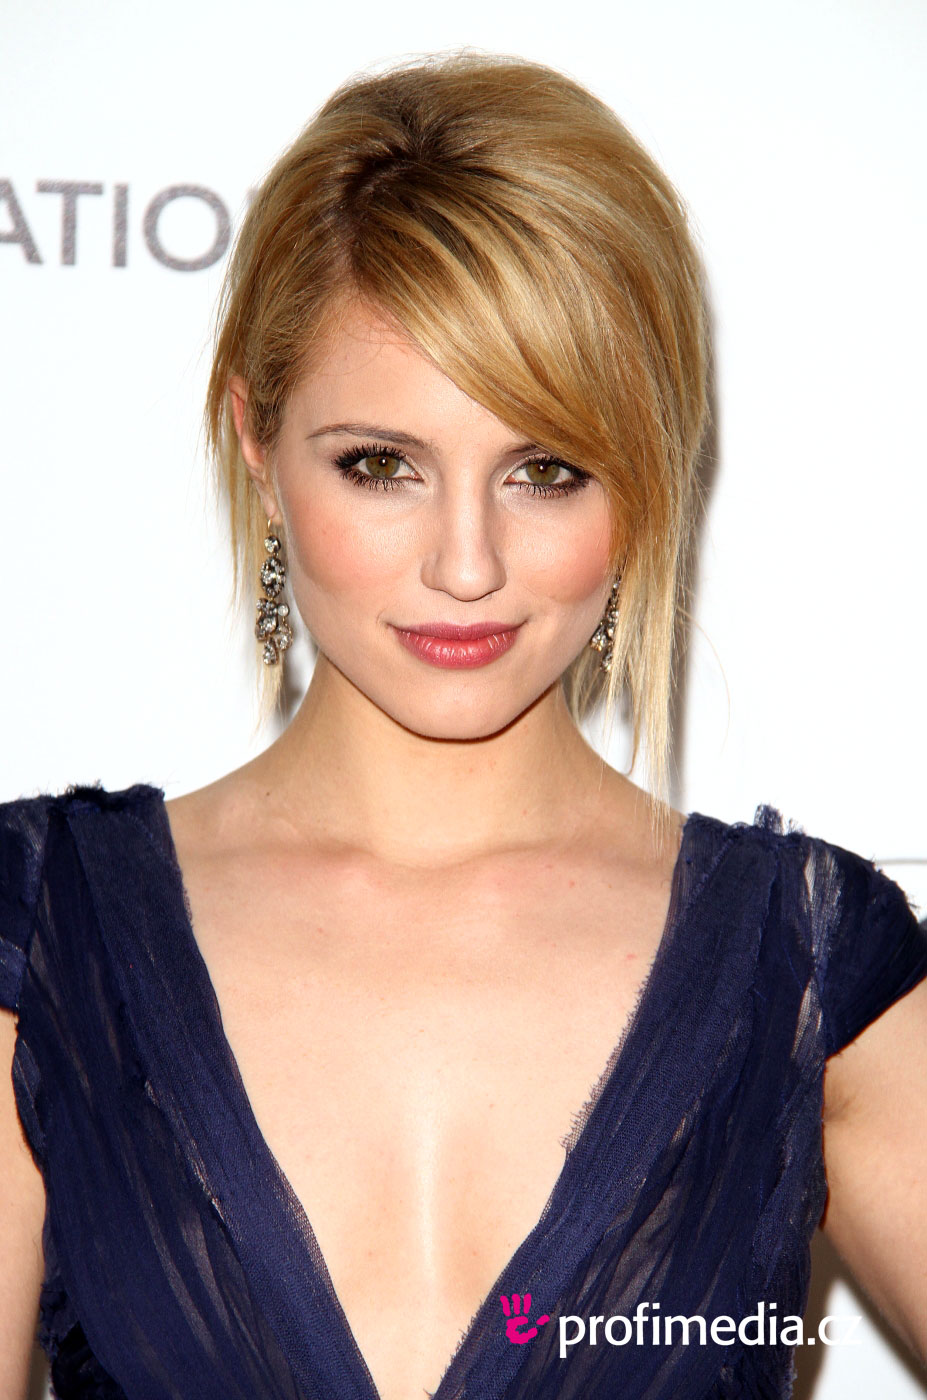 Dianna Agron Hairstyle Easyhairstyler